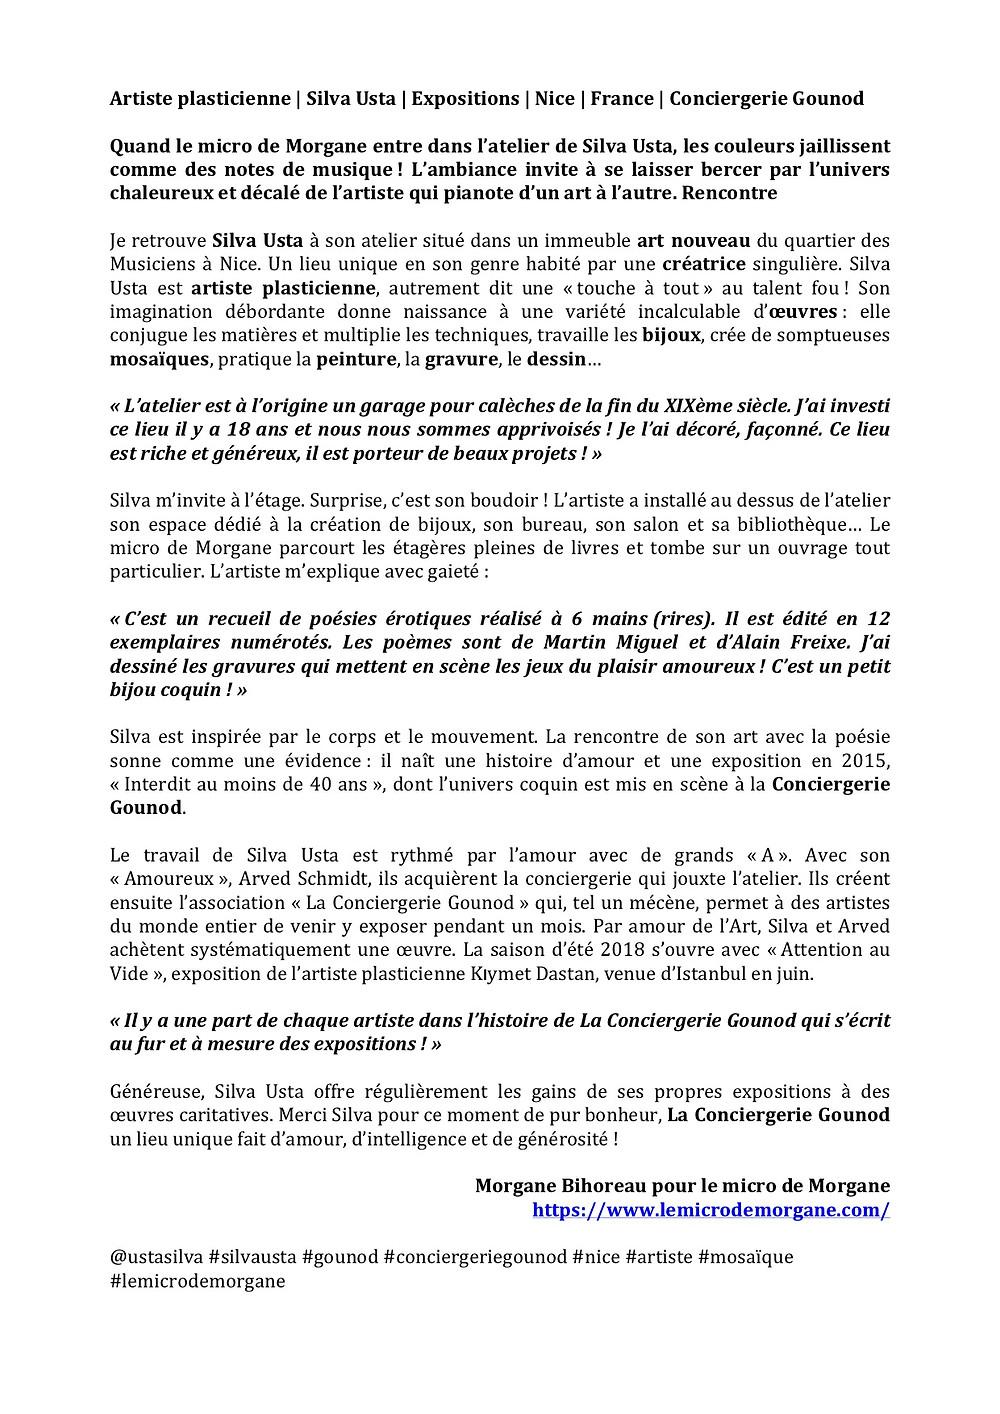 Silva Usta |Morgane Bihoreau |Nice |France|lemicrodemorgane.com